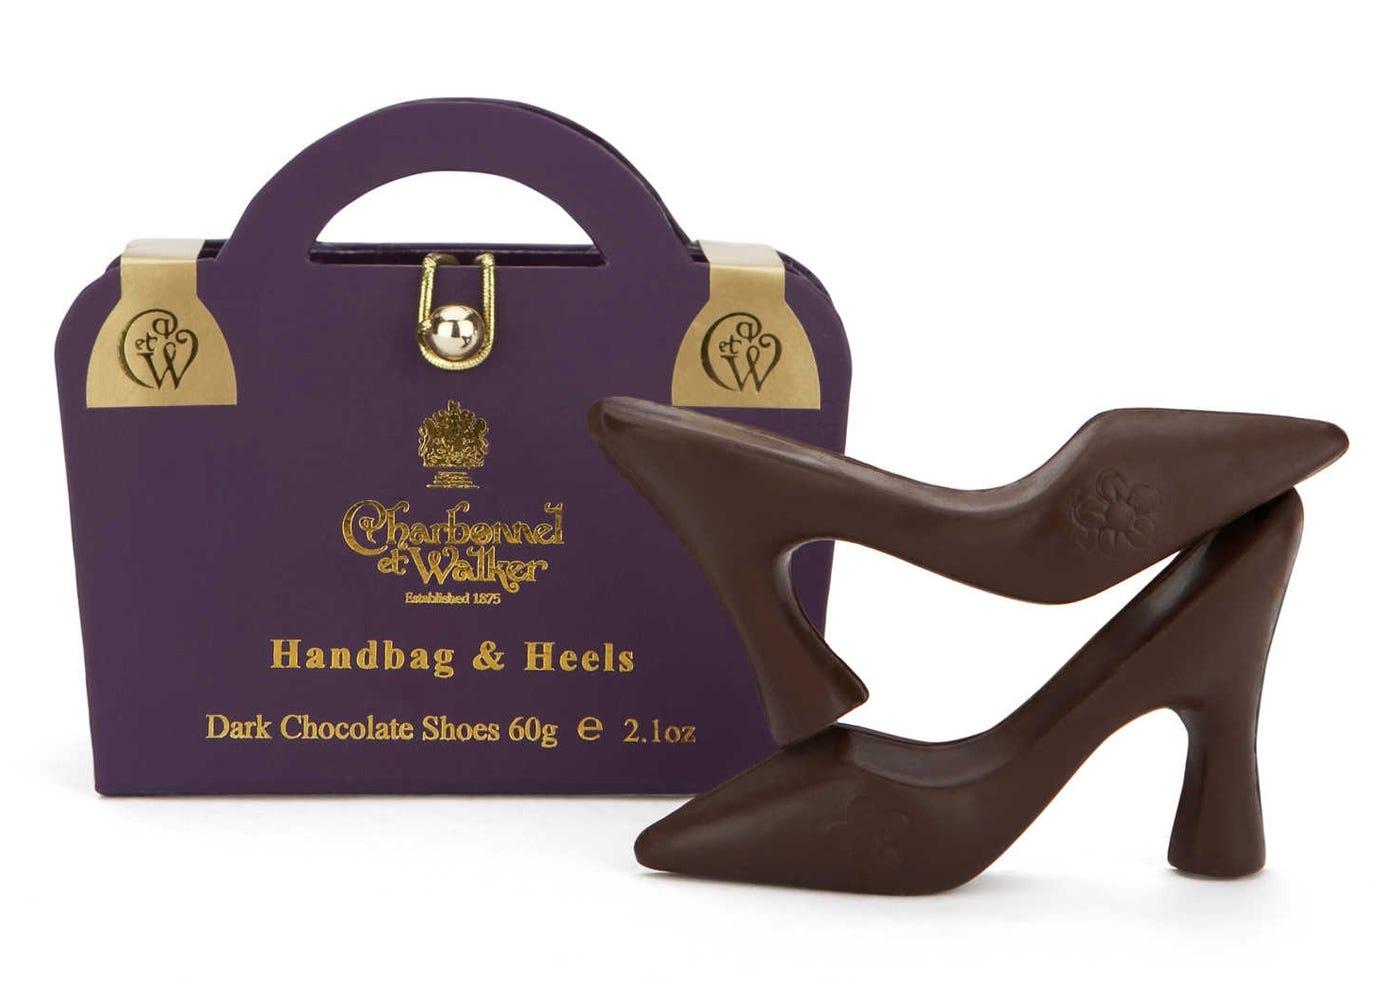 Handbag and Heels Purple Box